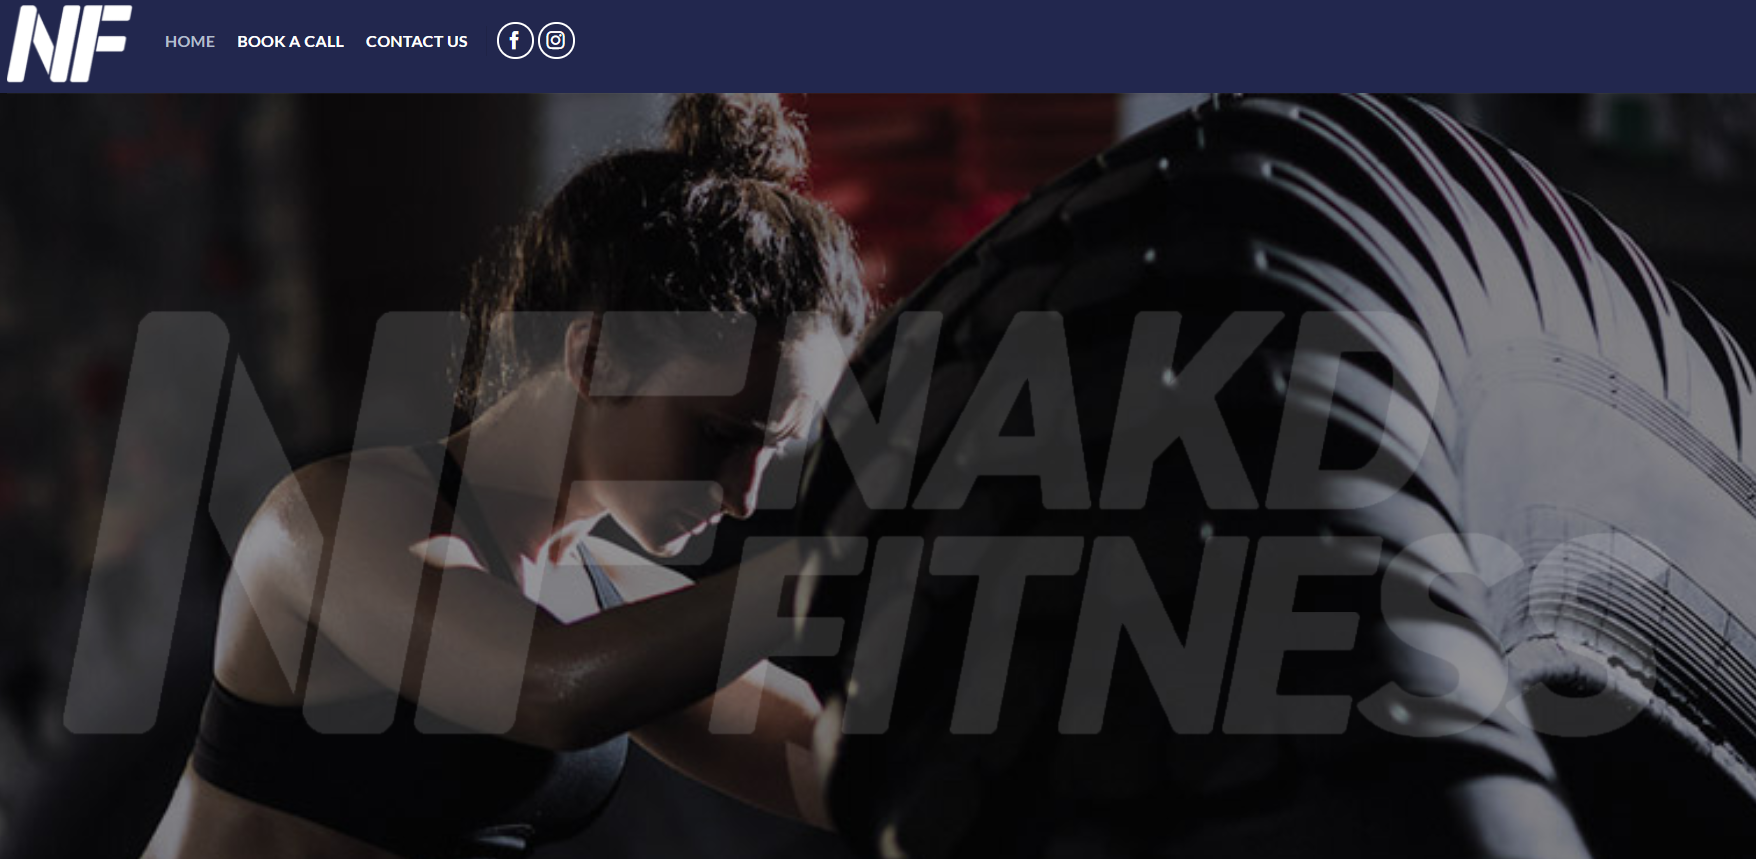 https://w2m.co.uk/project/nakd-fitness/